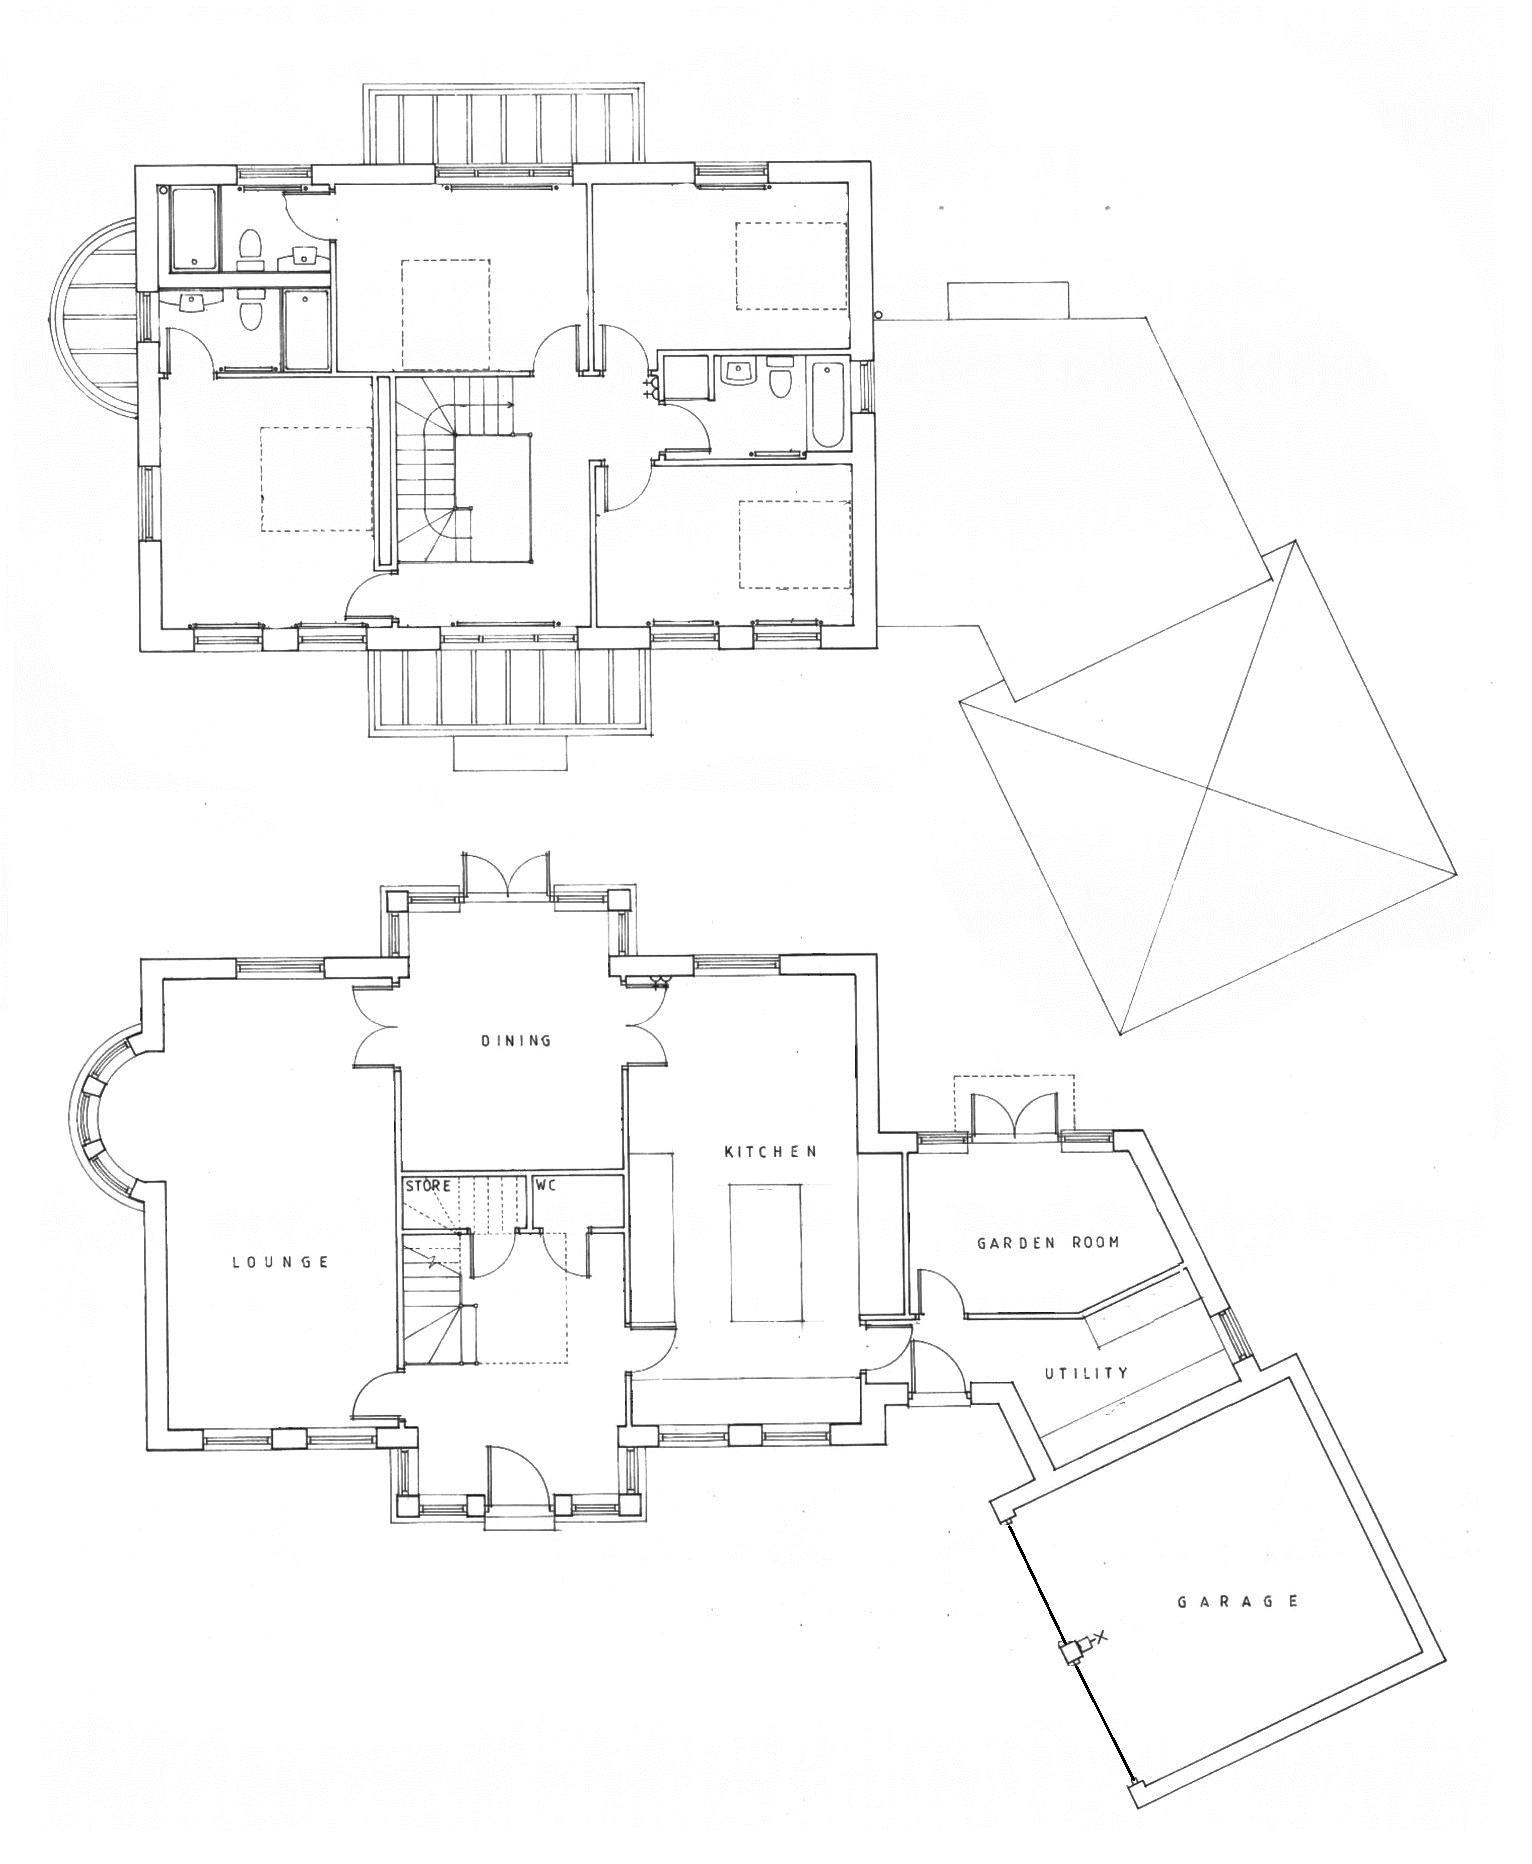 14 Manor Copse Felpham